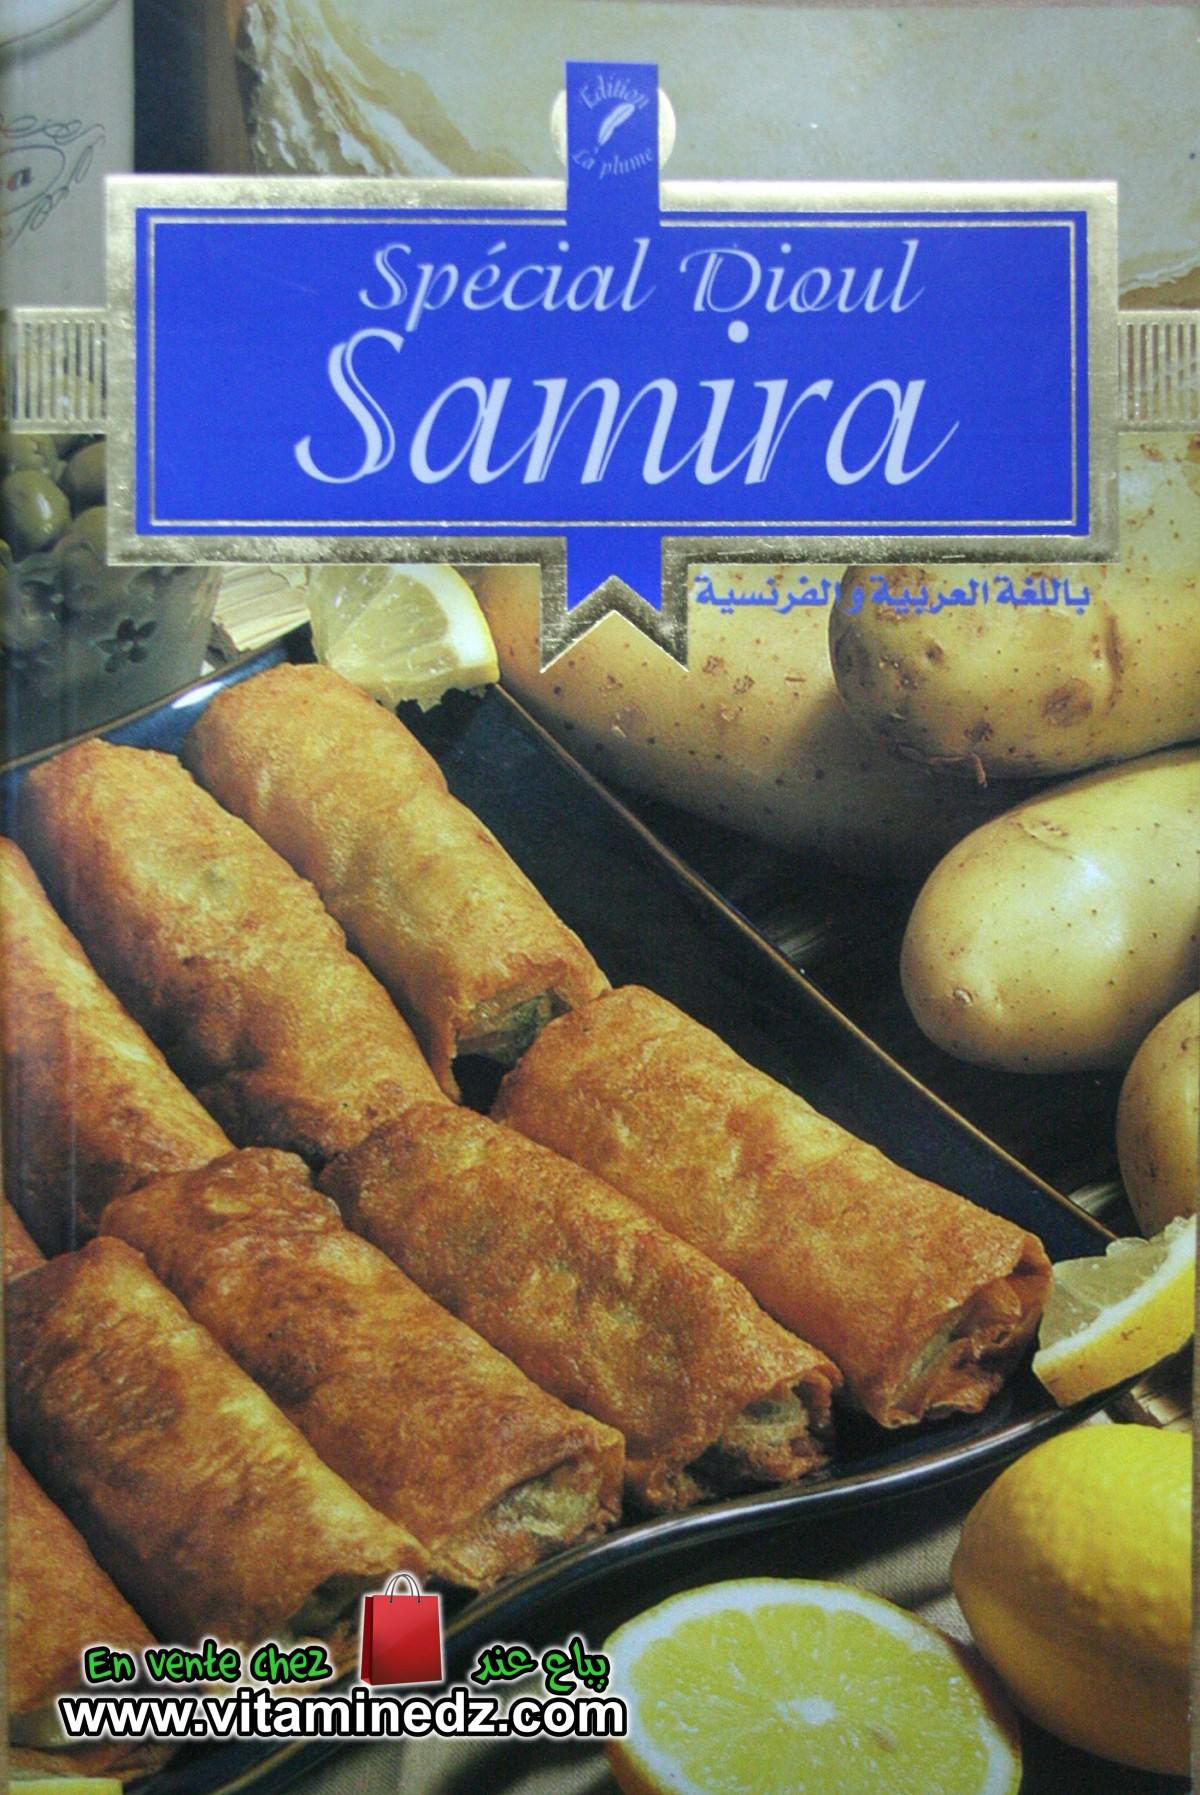 Samira - Spécial Dioul